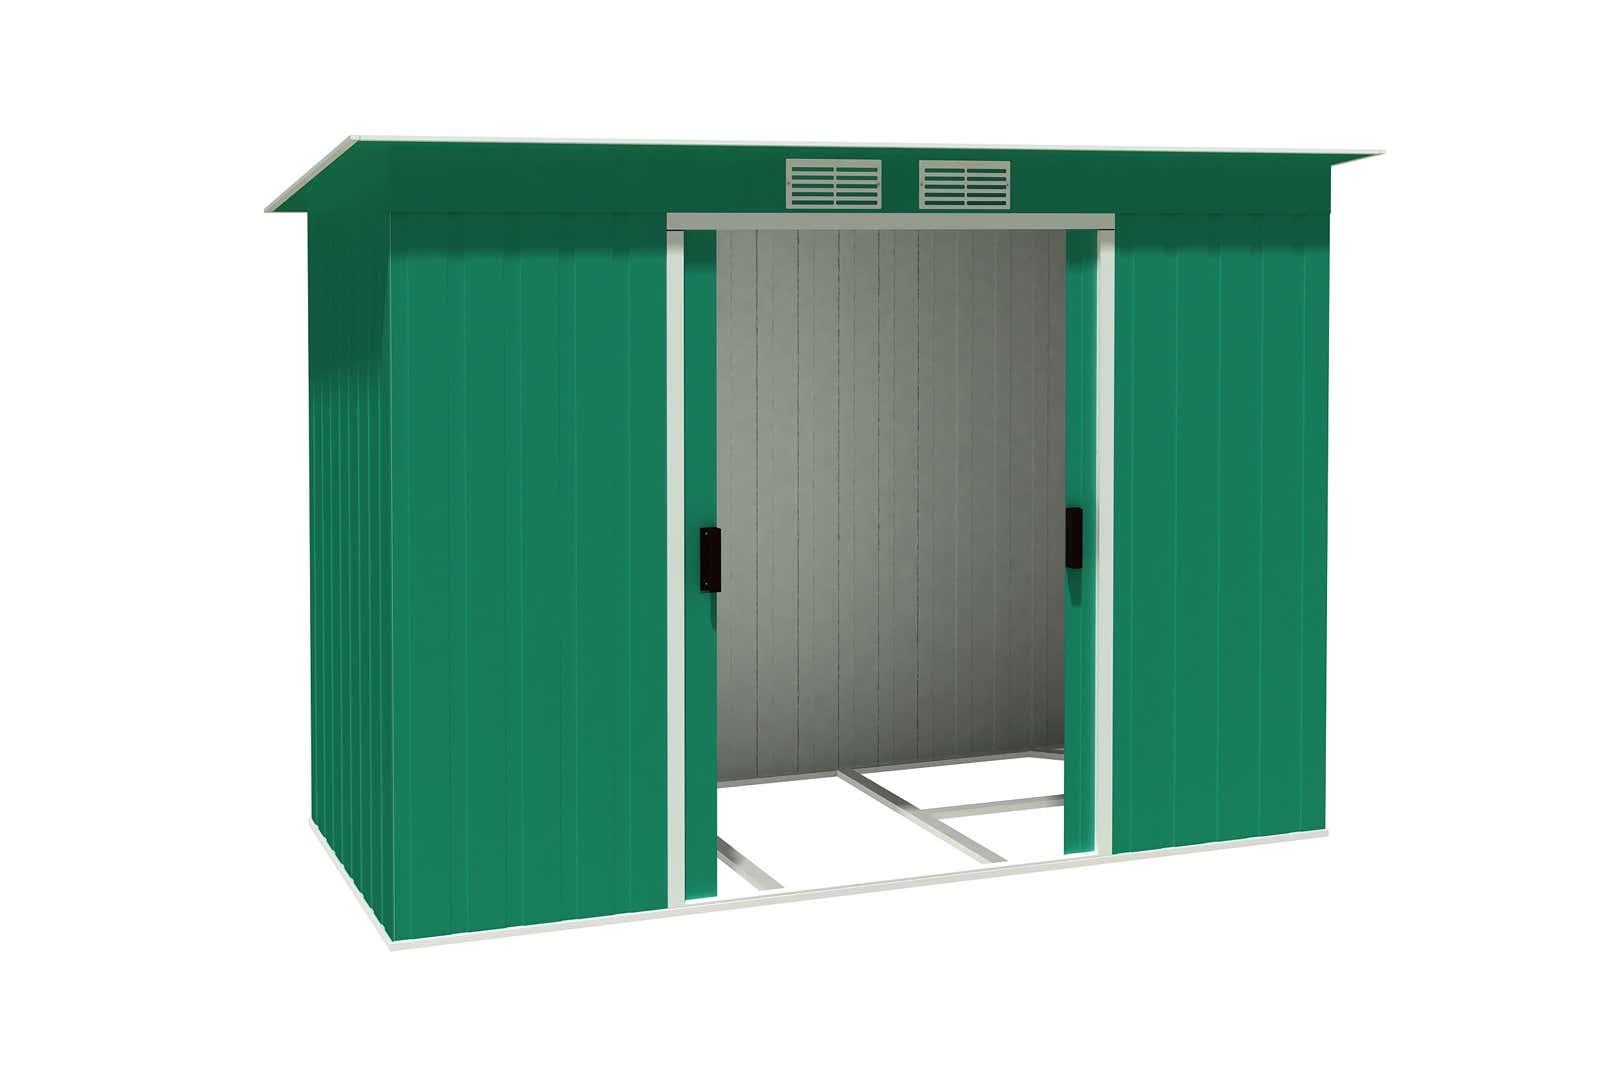 metallger tehaus pent roof 8x4 gr n 7117 a z gartenhaus gmbh. Black Bedroom Furniture Sets. Home Design Ideas